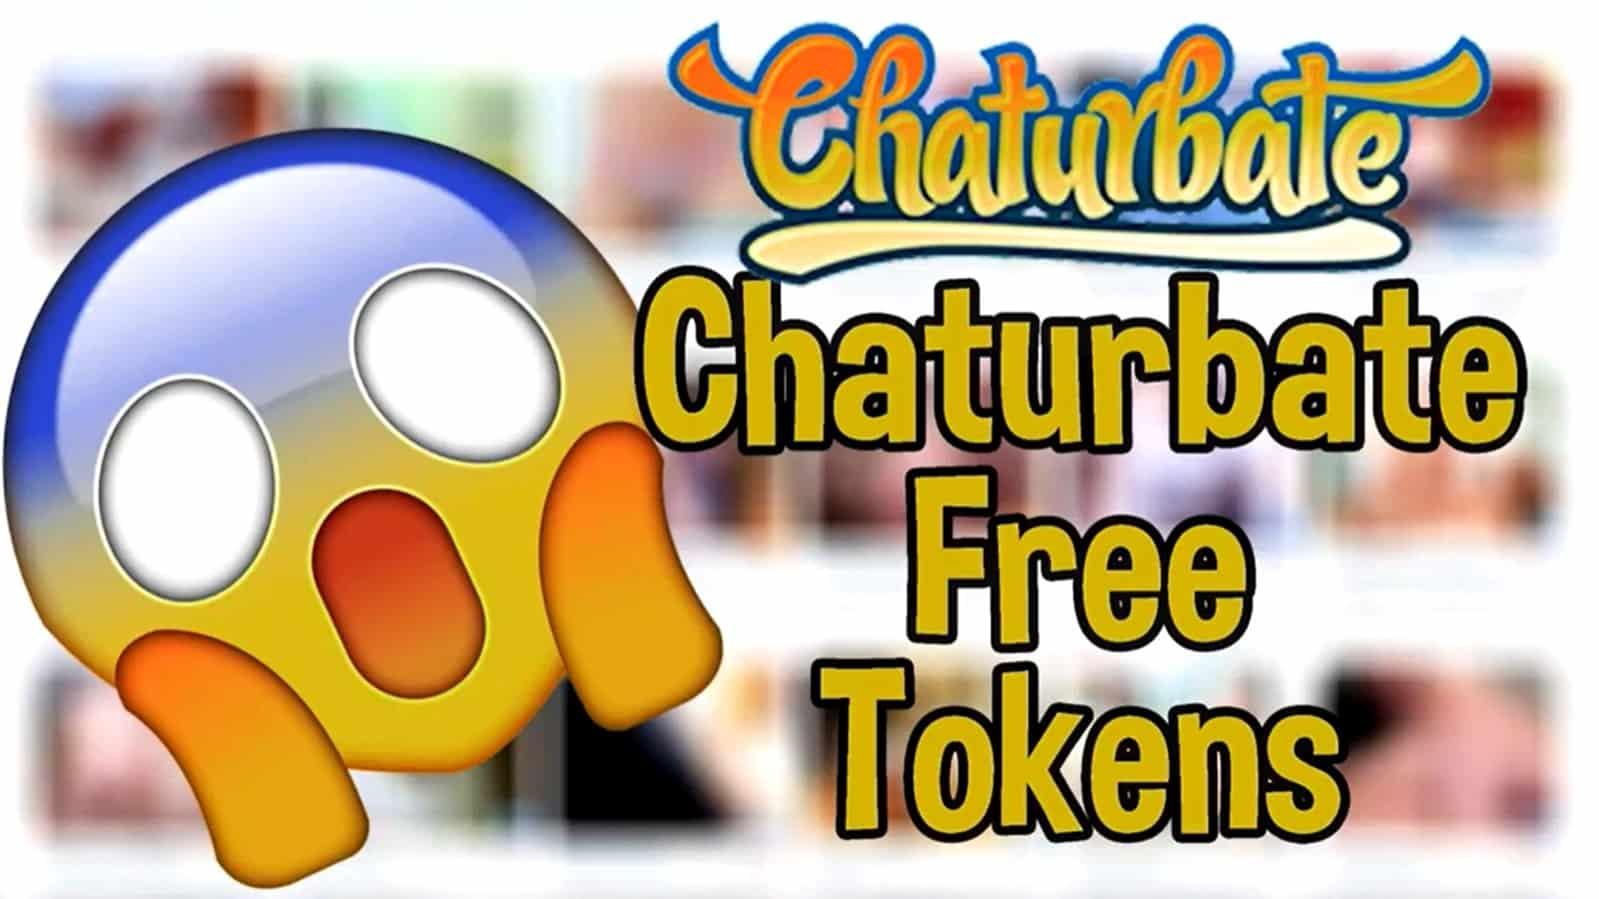 1000 tokens chaturbate